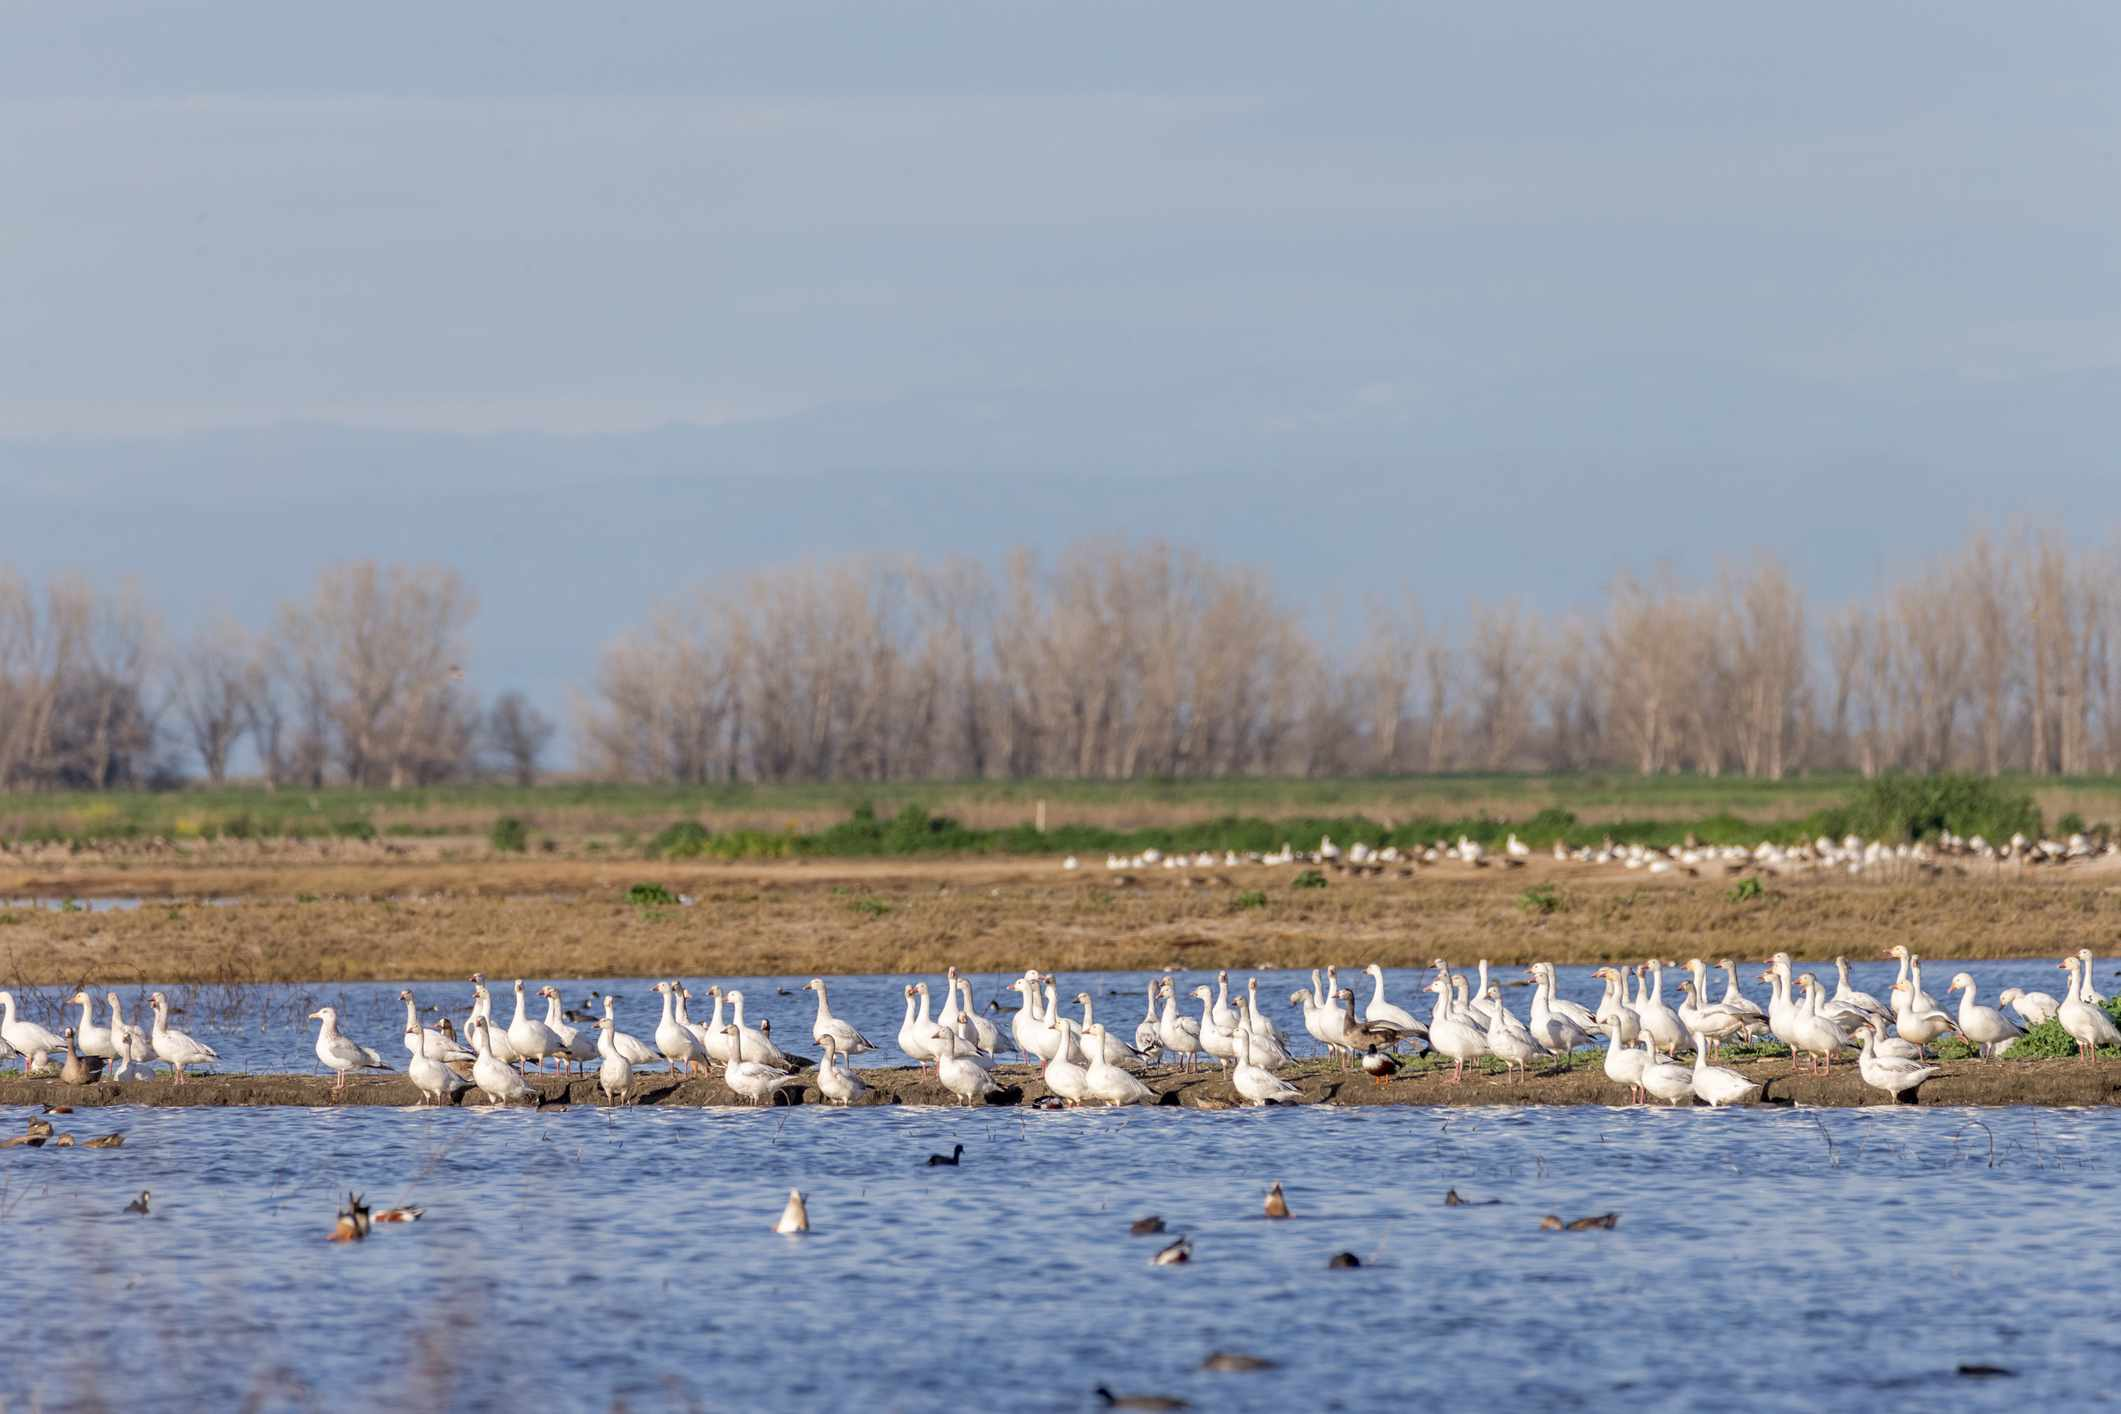 Flock of snow geese at Merced National Wildlife Refuge